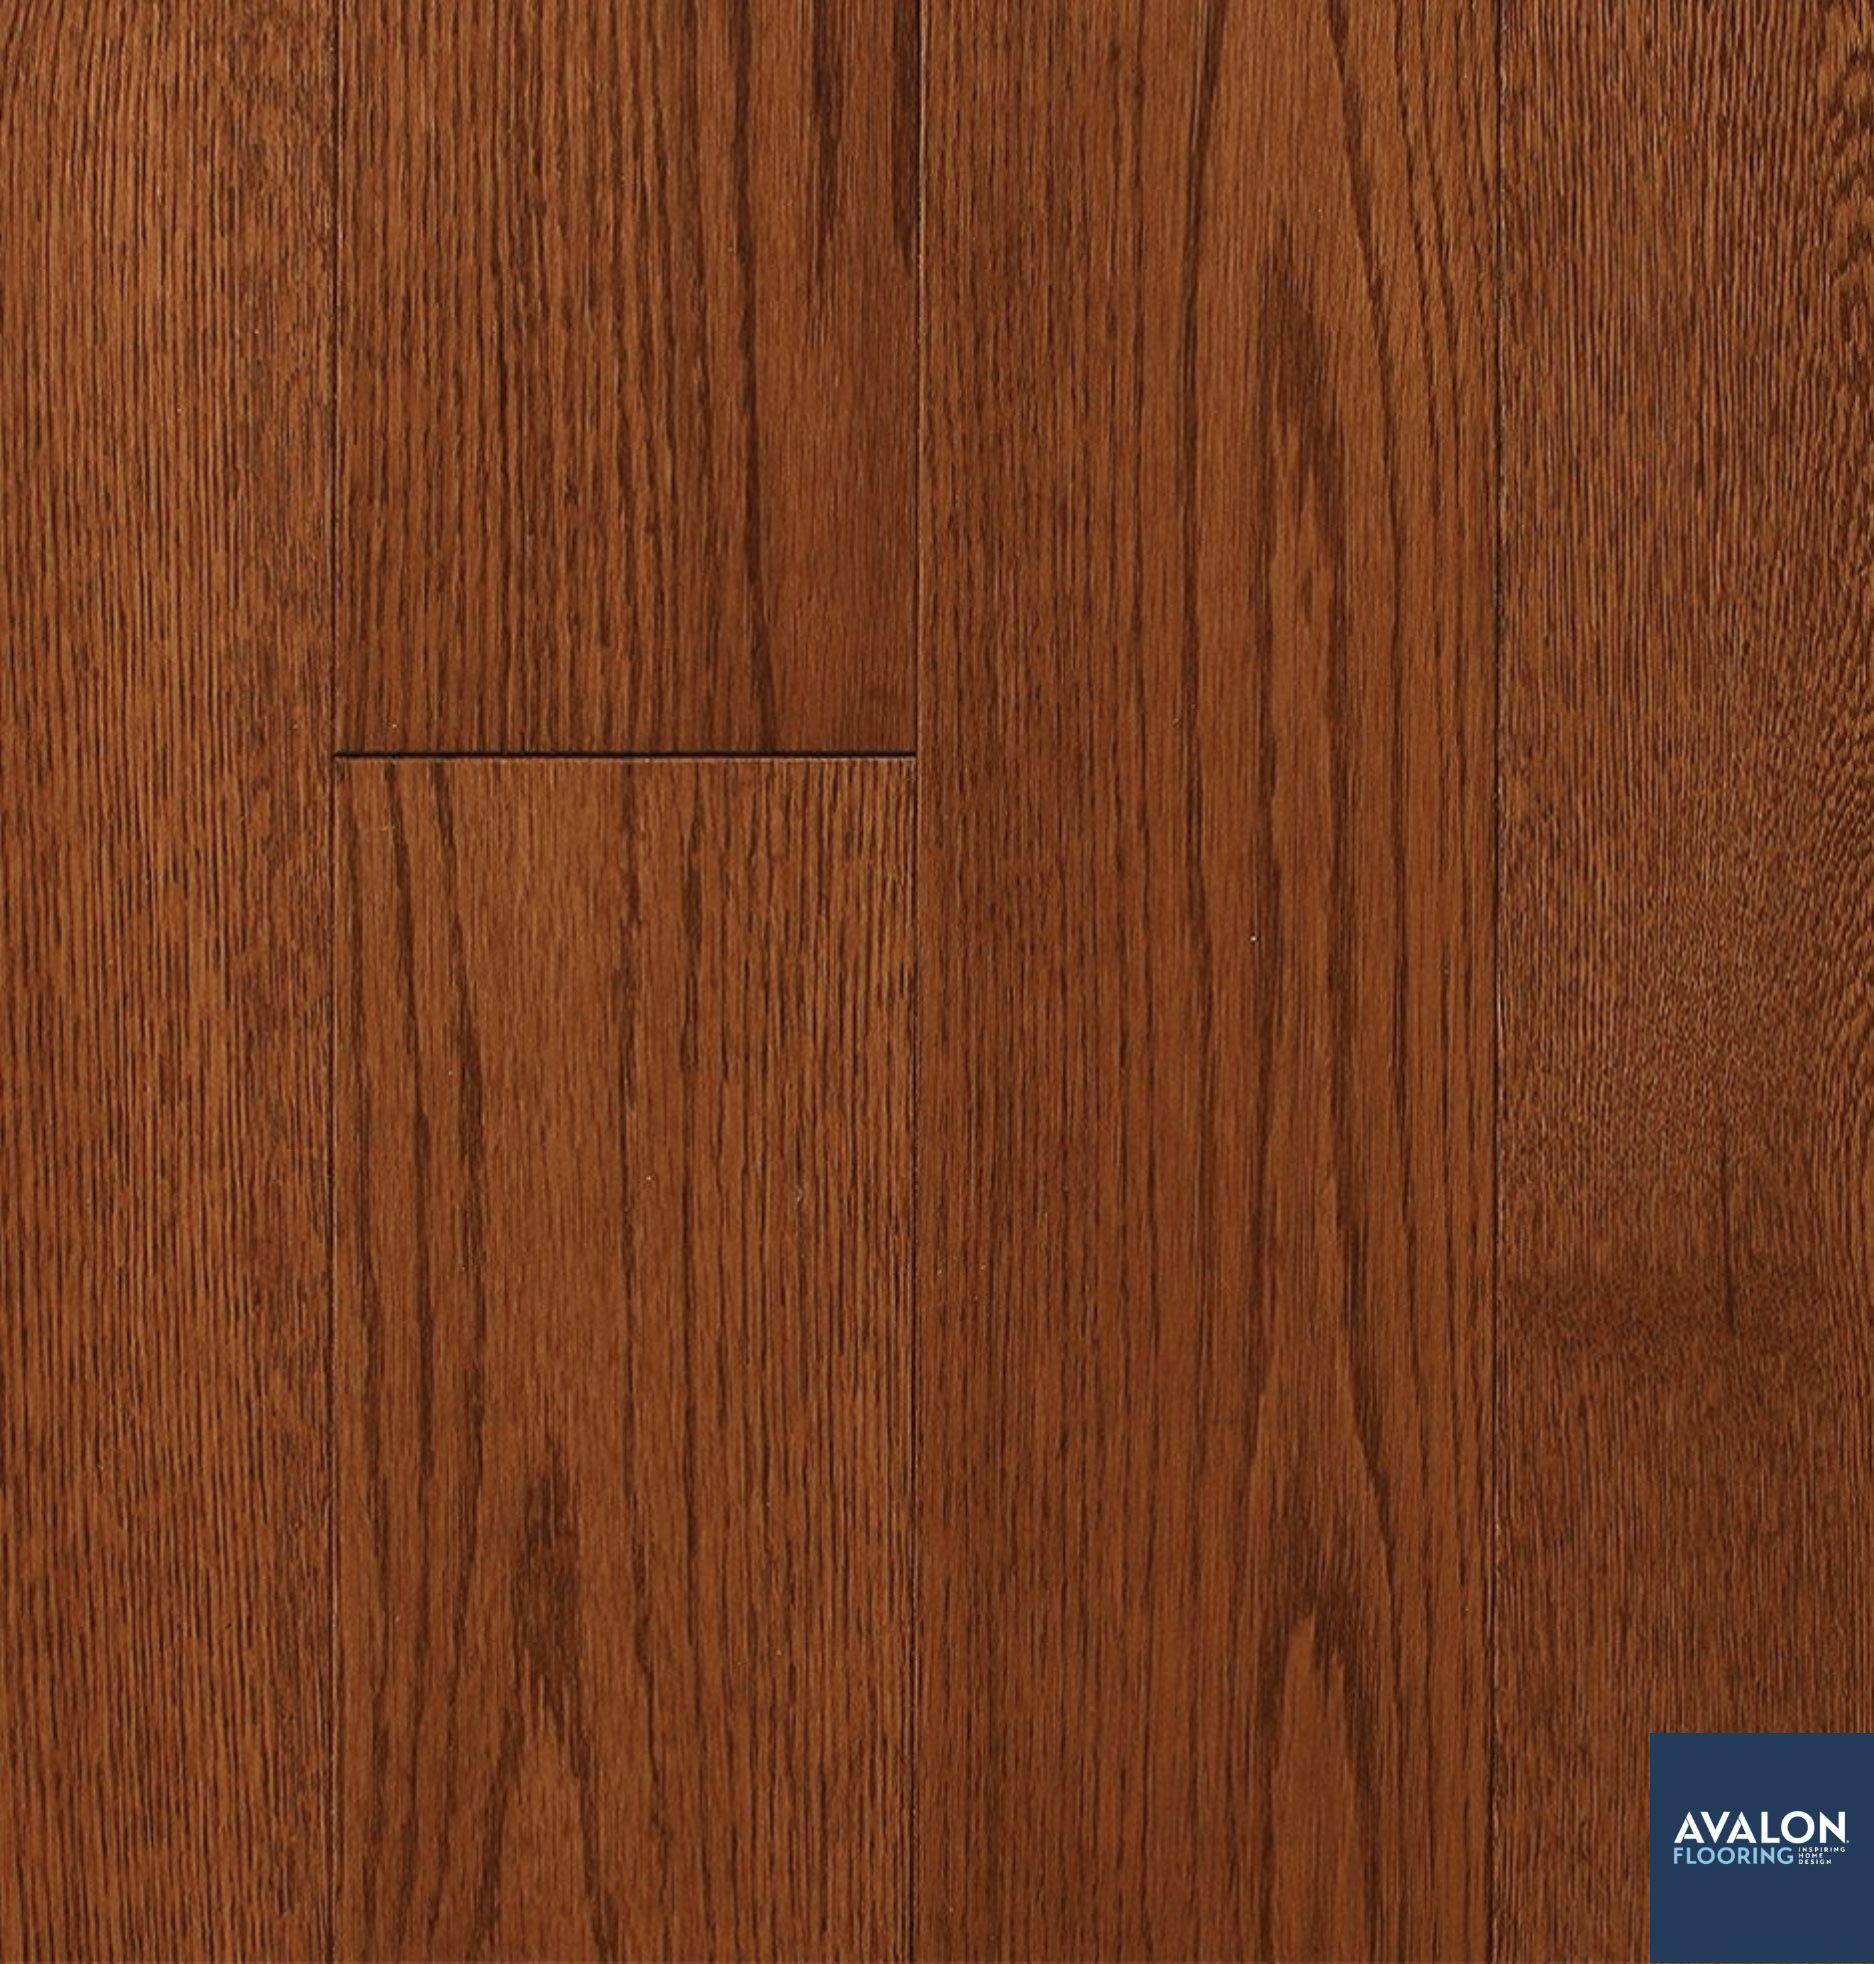 Pin On Avalon Hardwood Collection